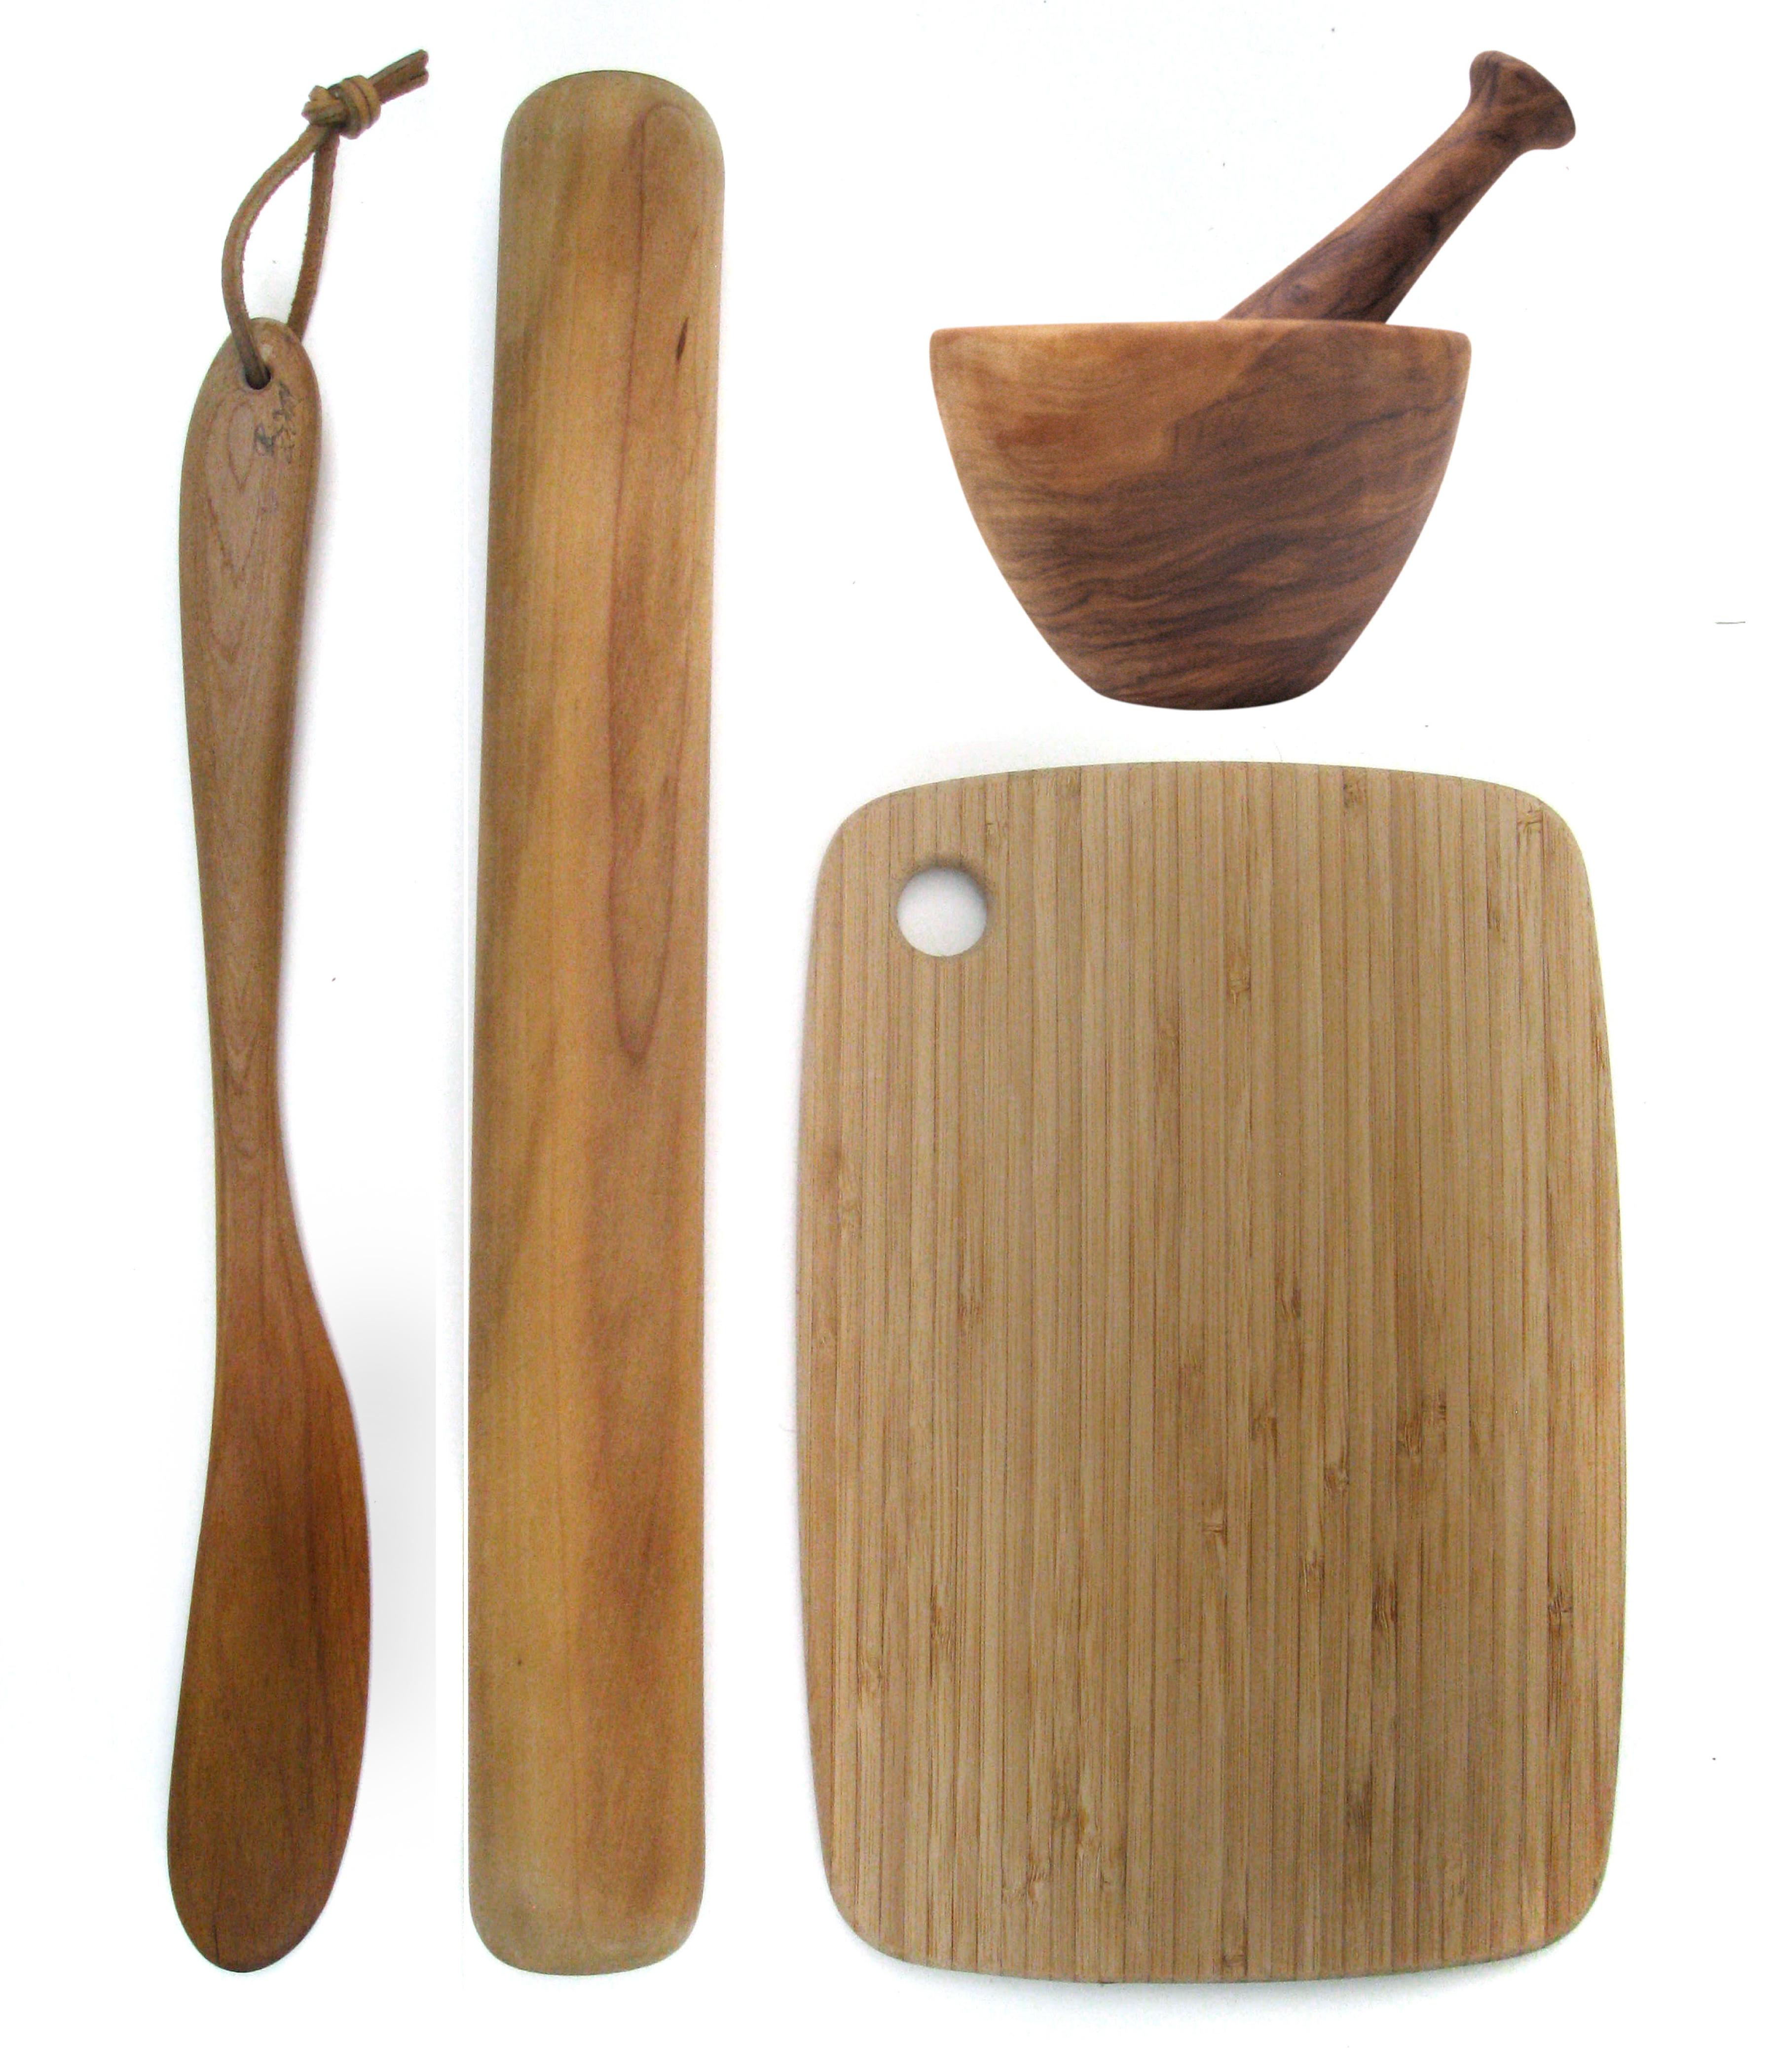 Kitchen Design Utensils: Kitchen Tools Name And Image. Kitchen Utensils List